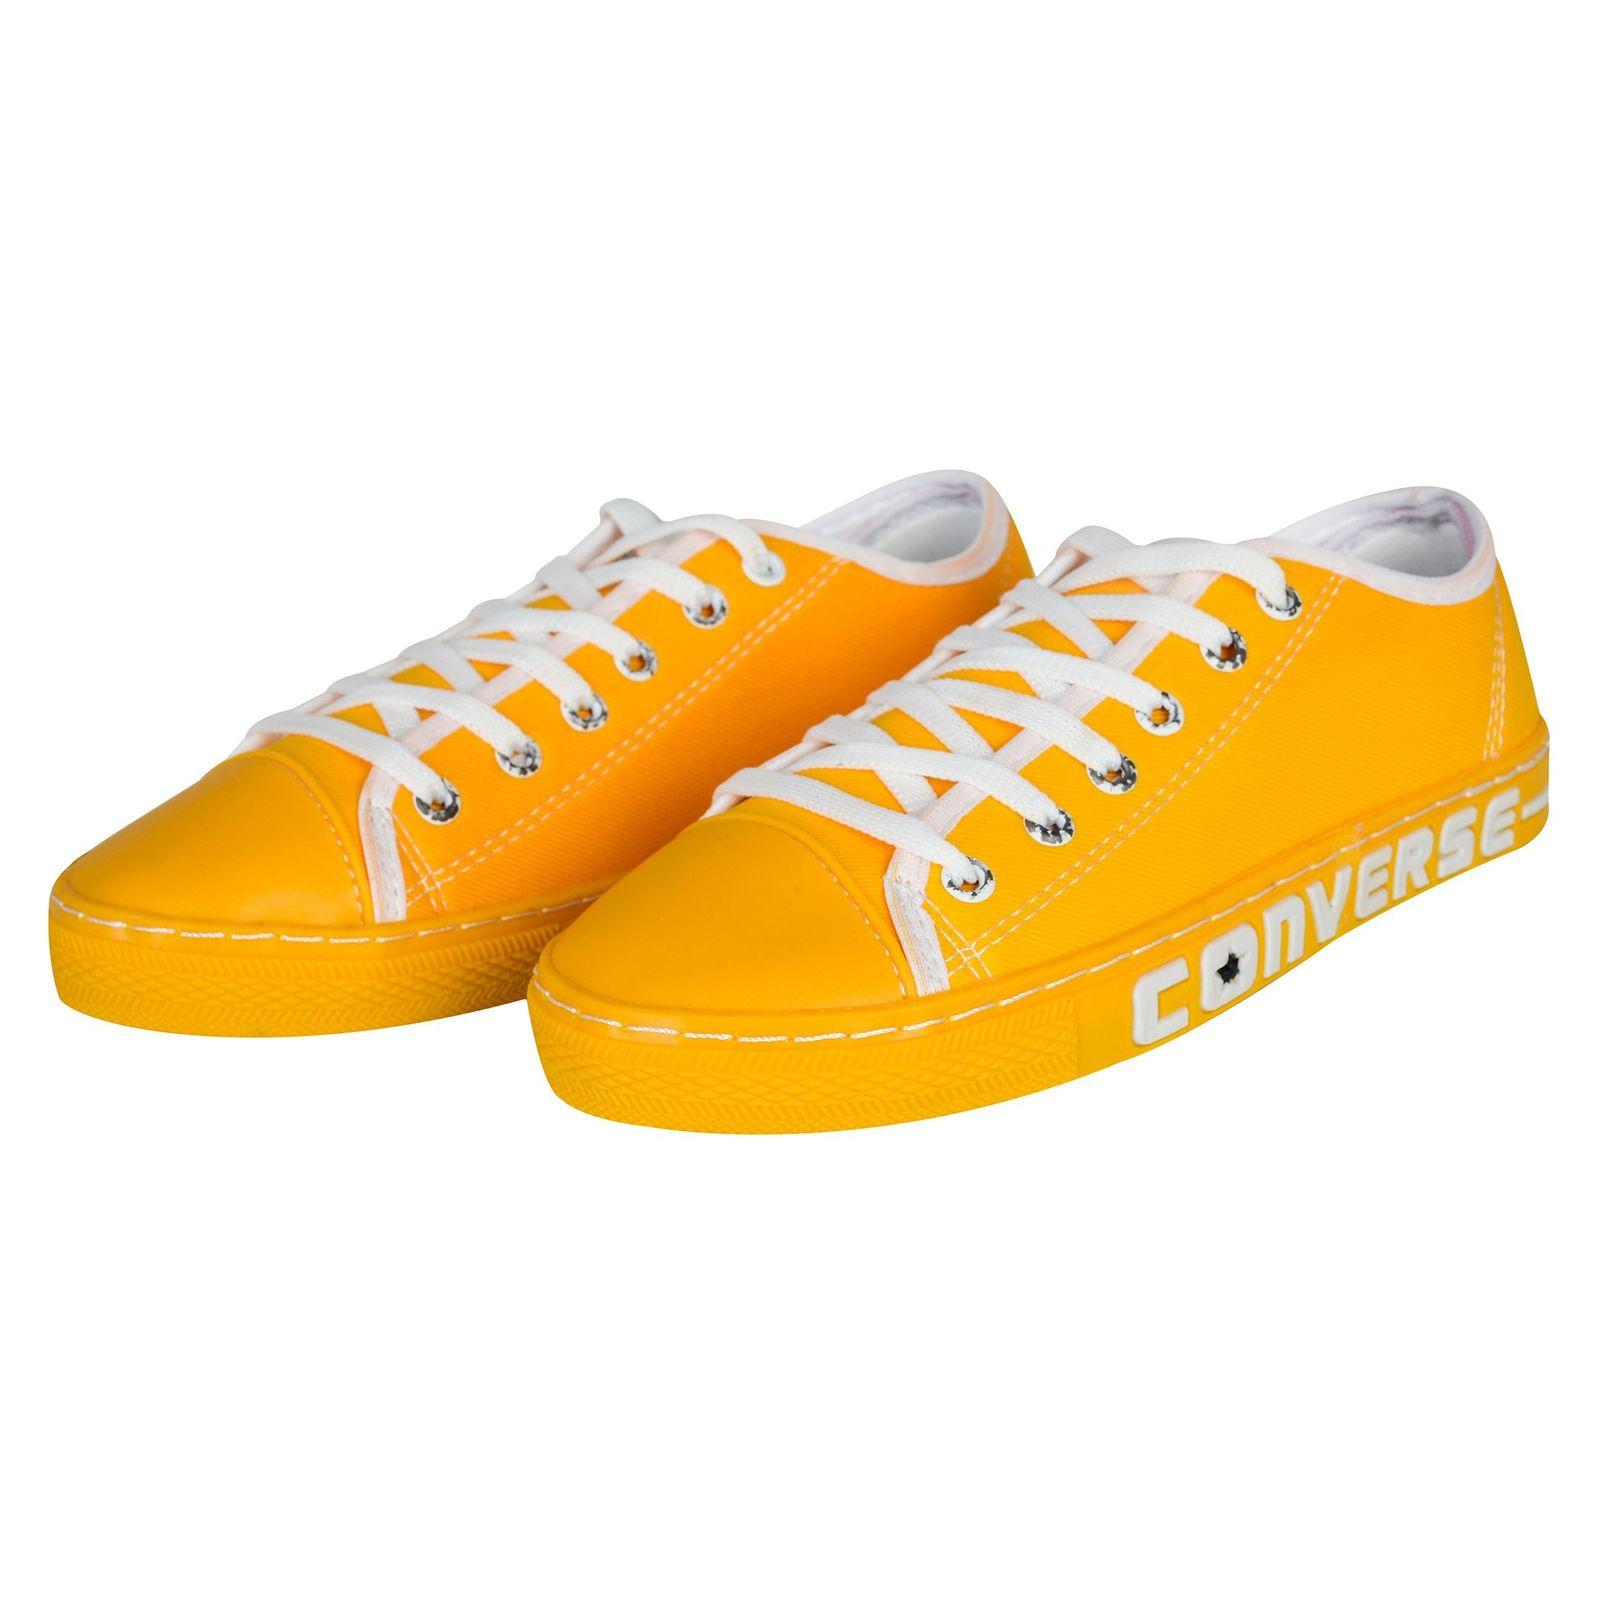 کفش راحتی زنانه کد n203 main 1 2